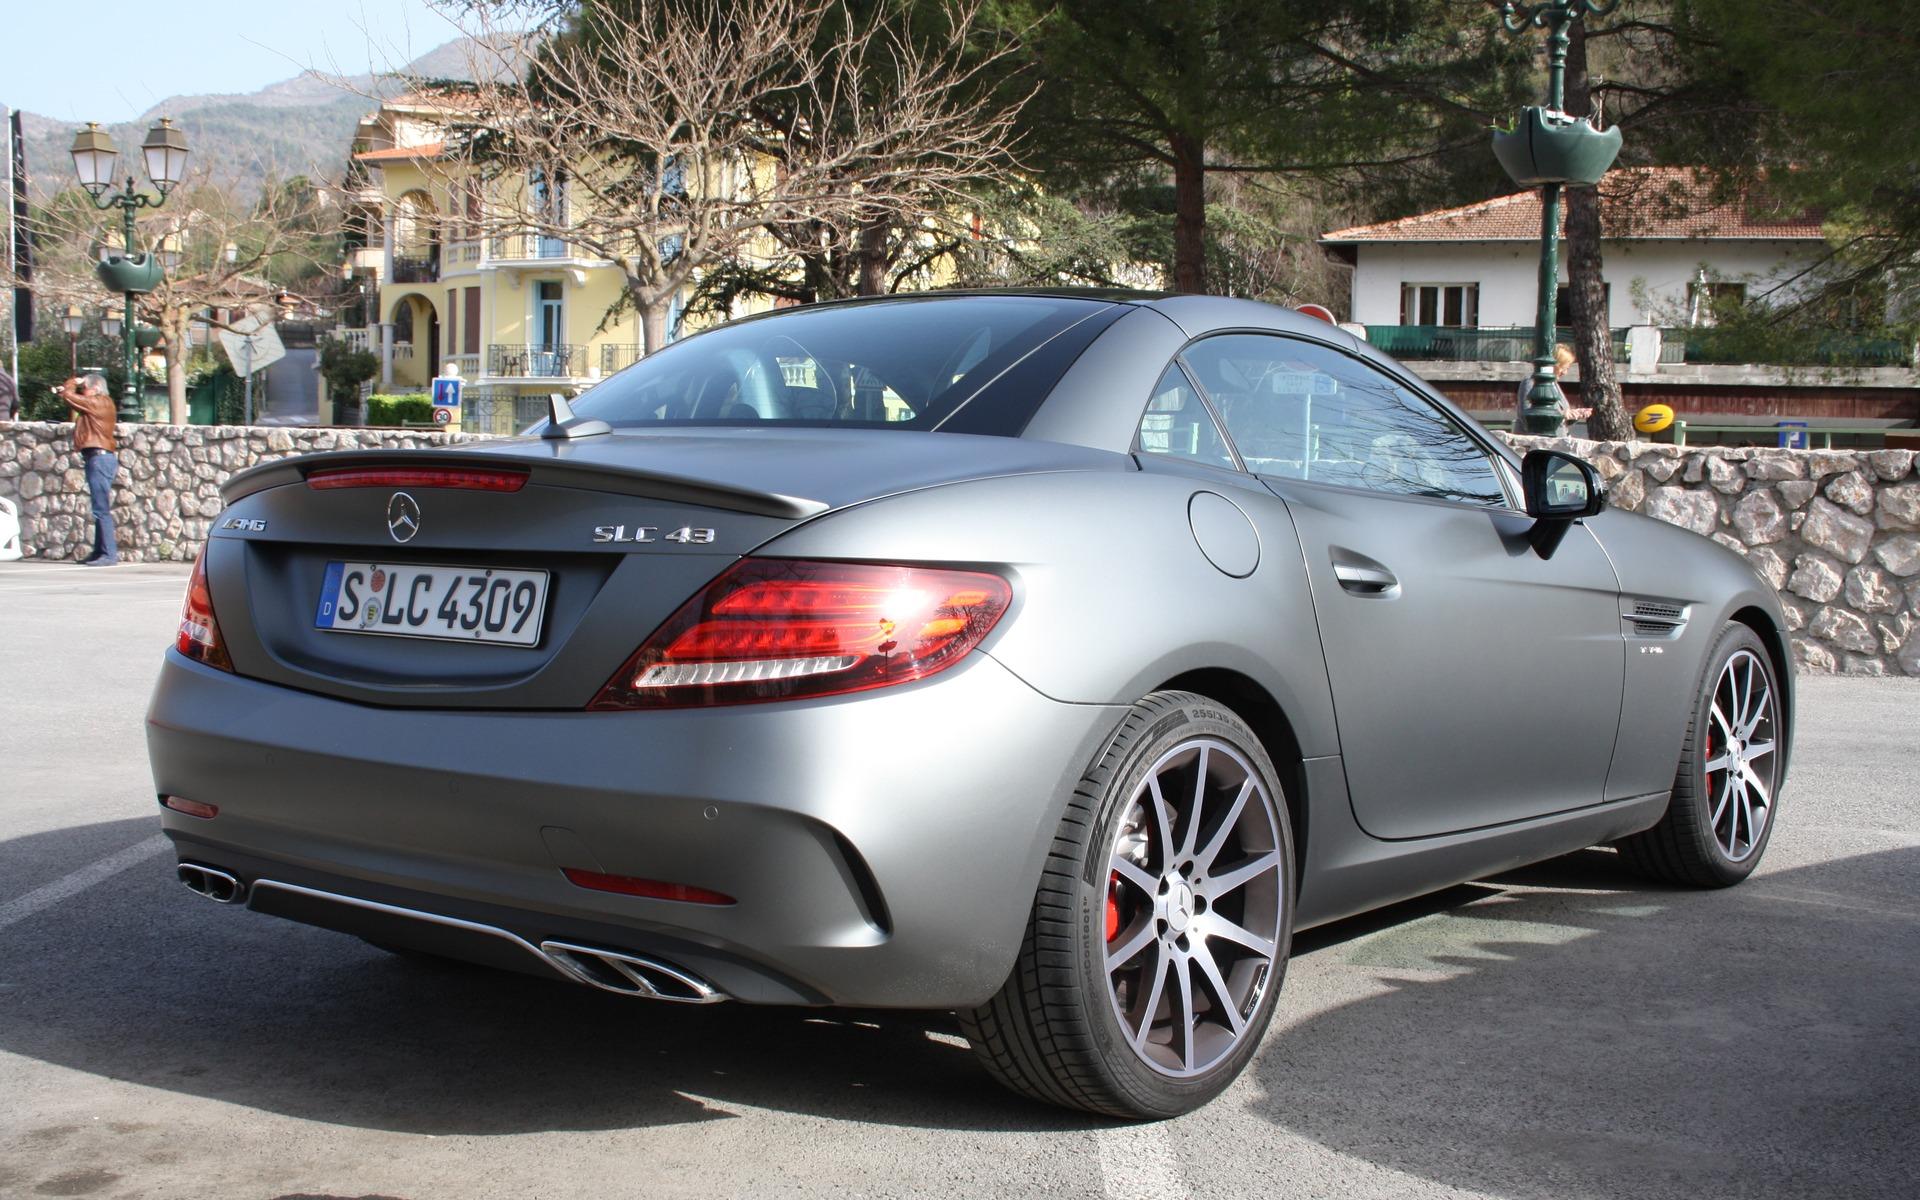 https://i.gaw.to/photos/2/4/5/245389_2017_Mercedes-Benz_SLC.jpg